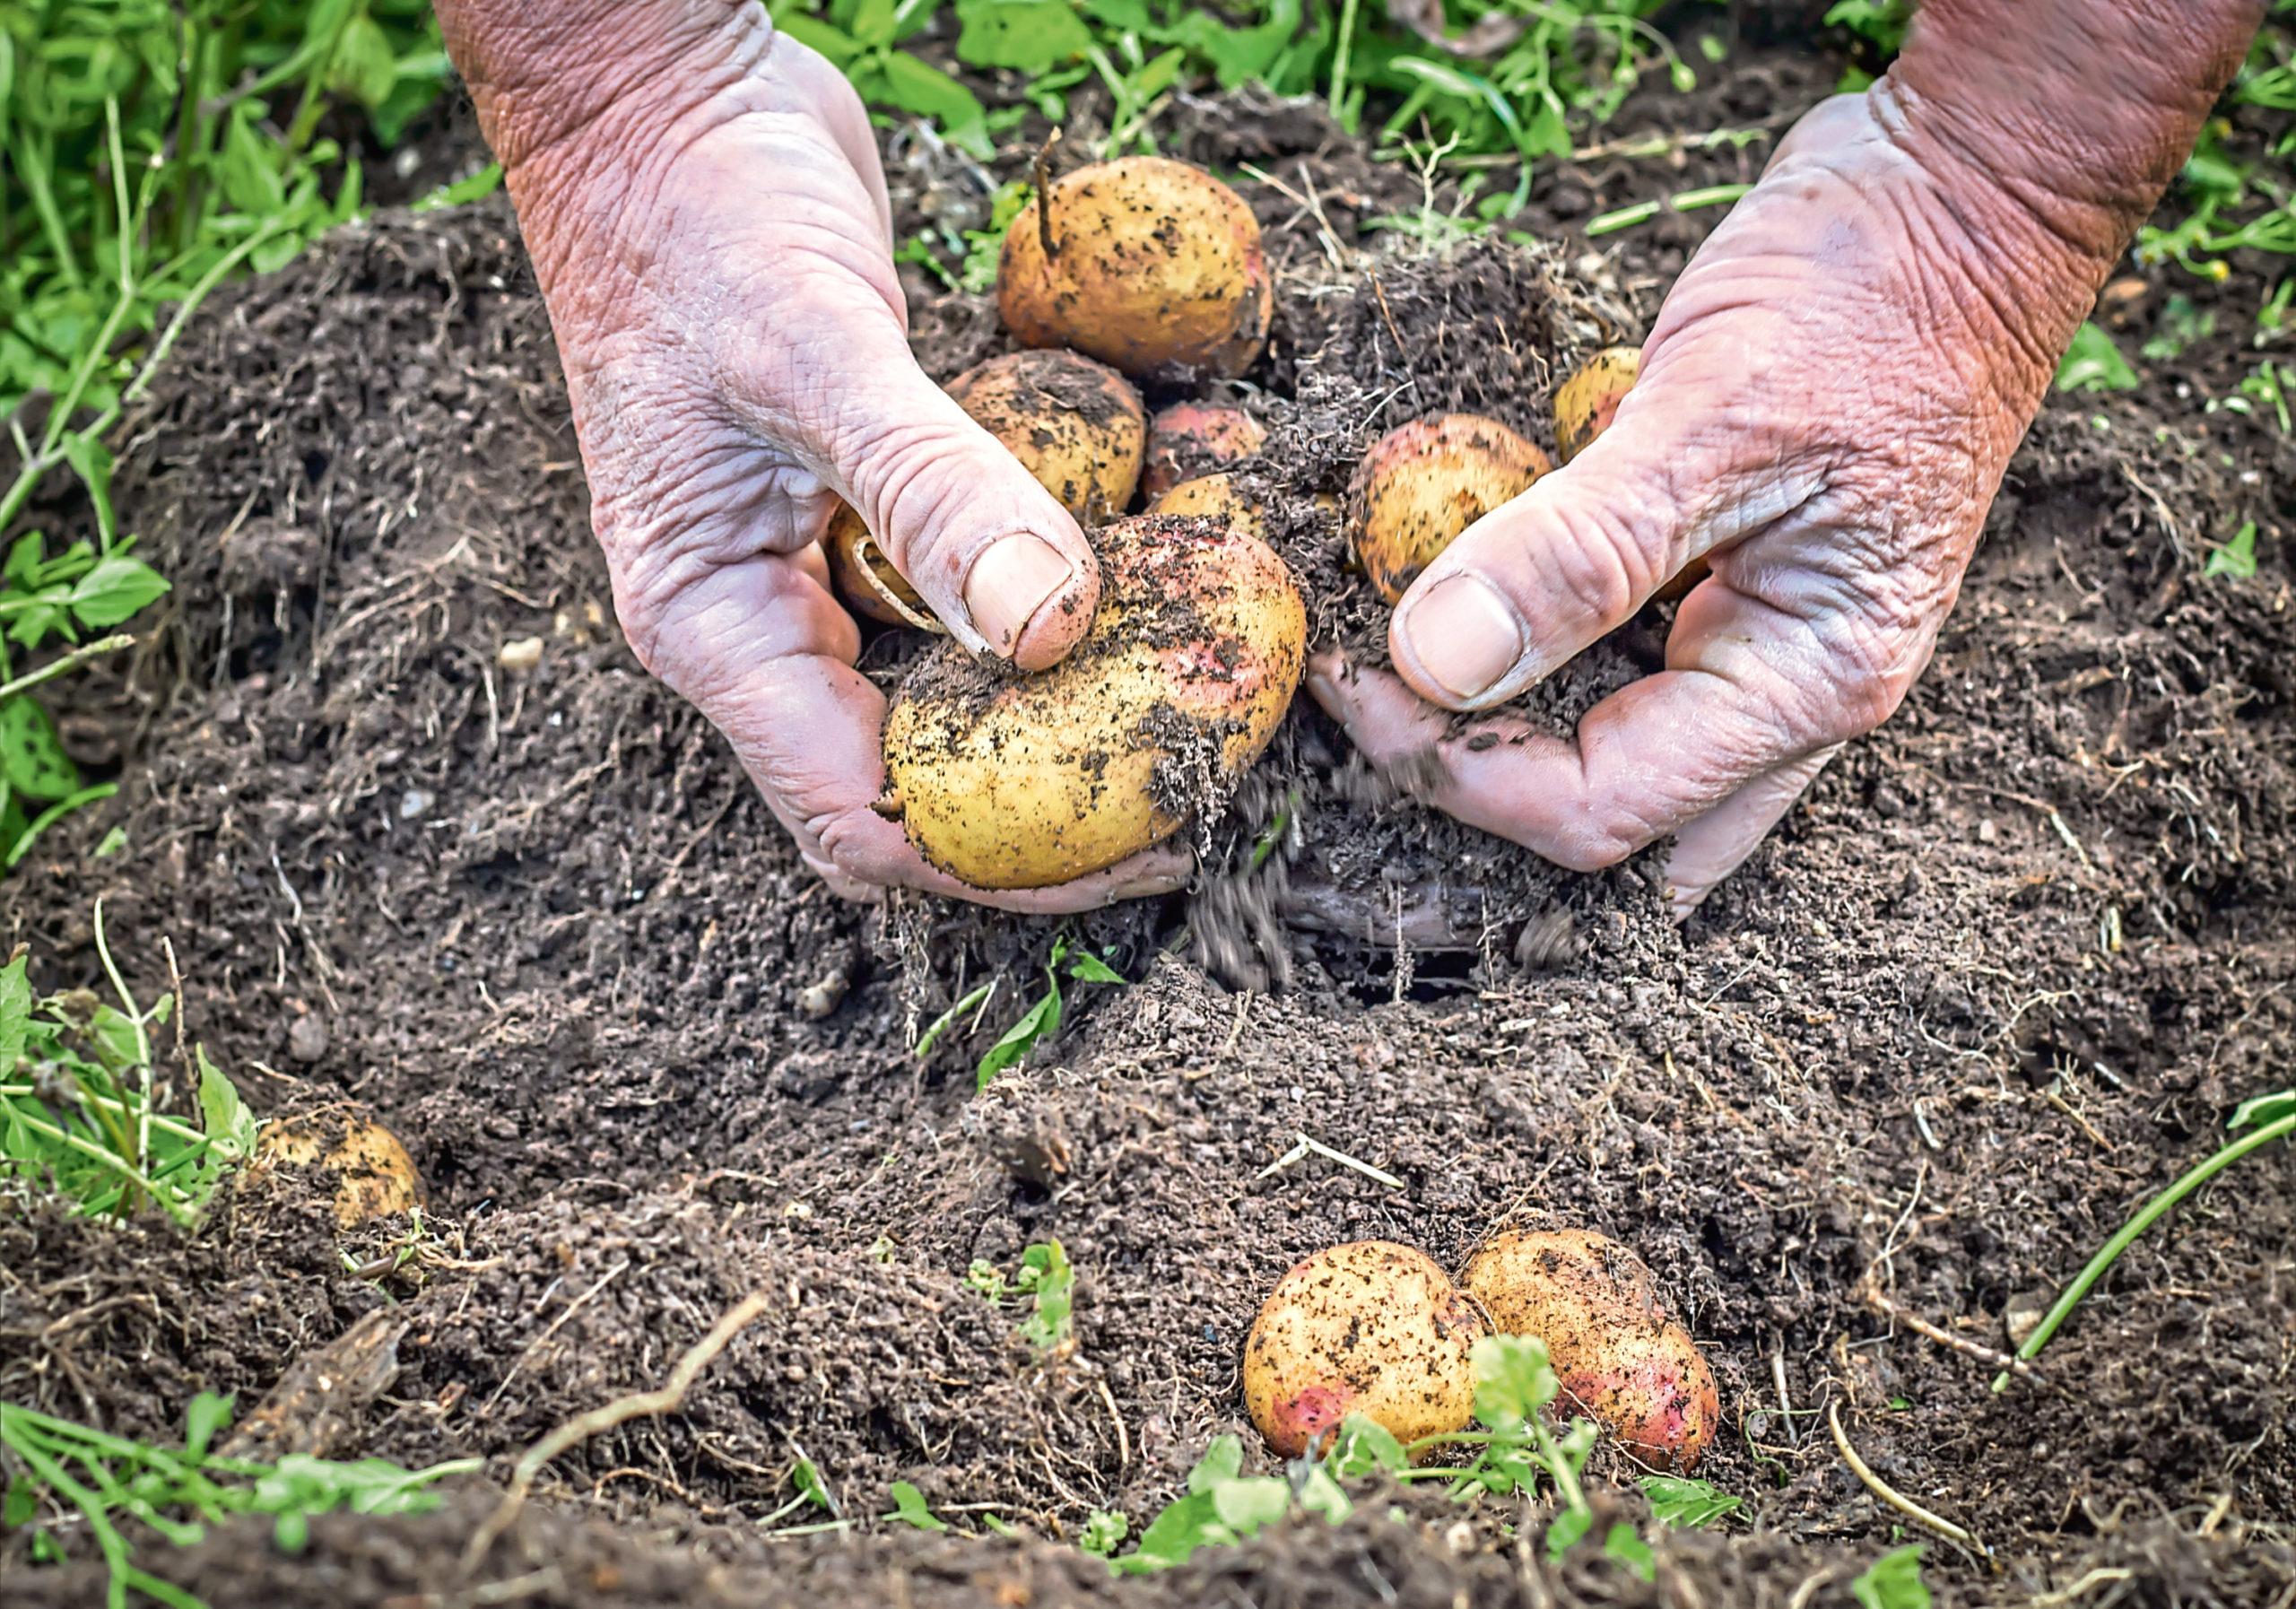 Fresh potatoes grown at home taste so much better